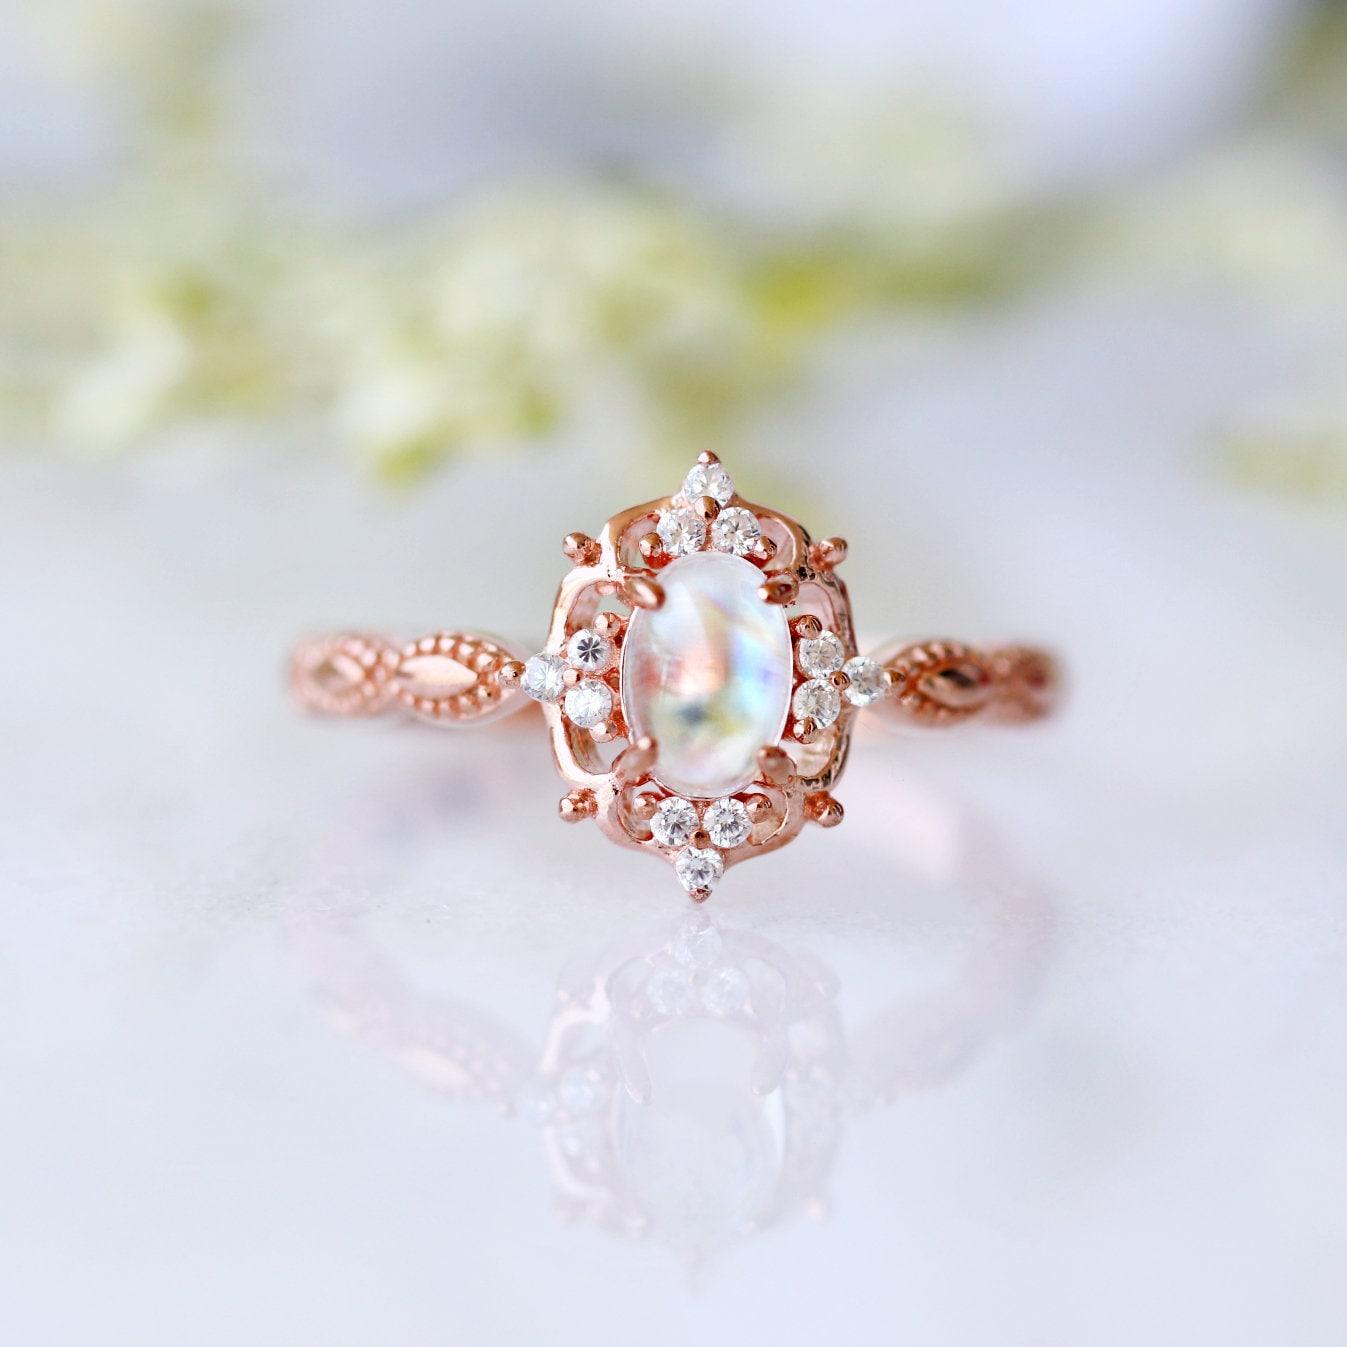 Ring for Her Natural Moonstone Ring in 14K White Gold Plated for Women Engagement Ring Promise Ring Gift For Her June Birthstone